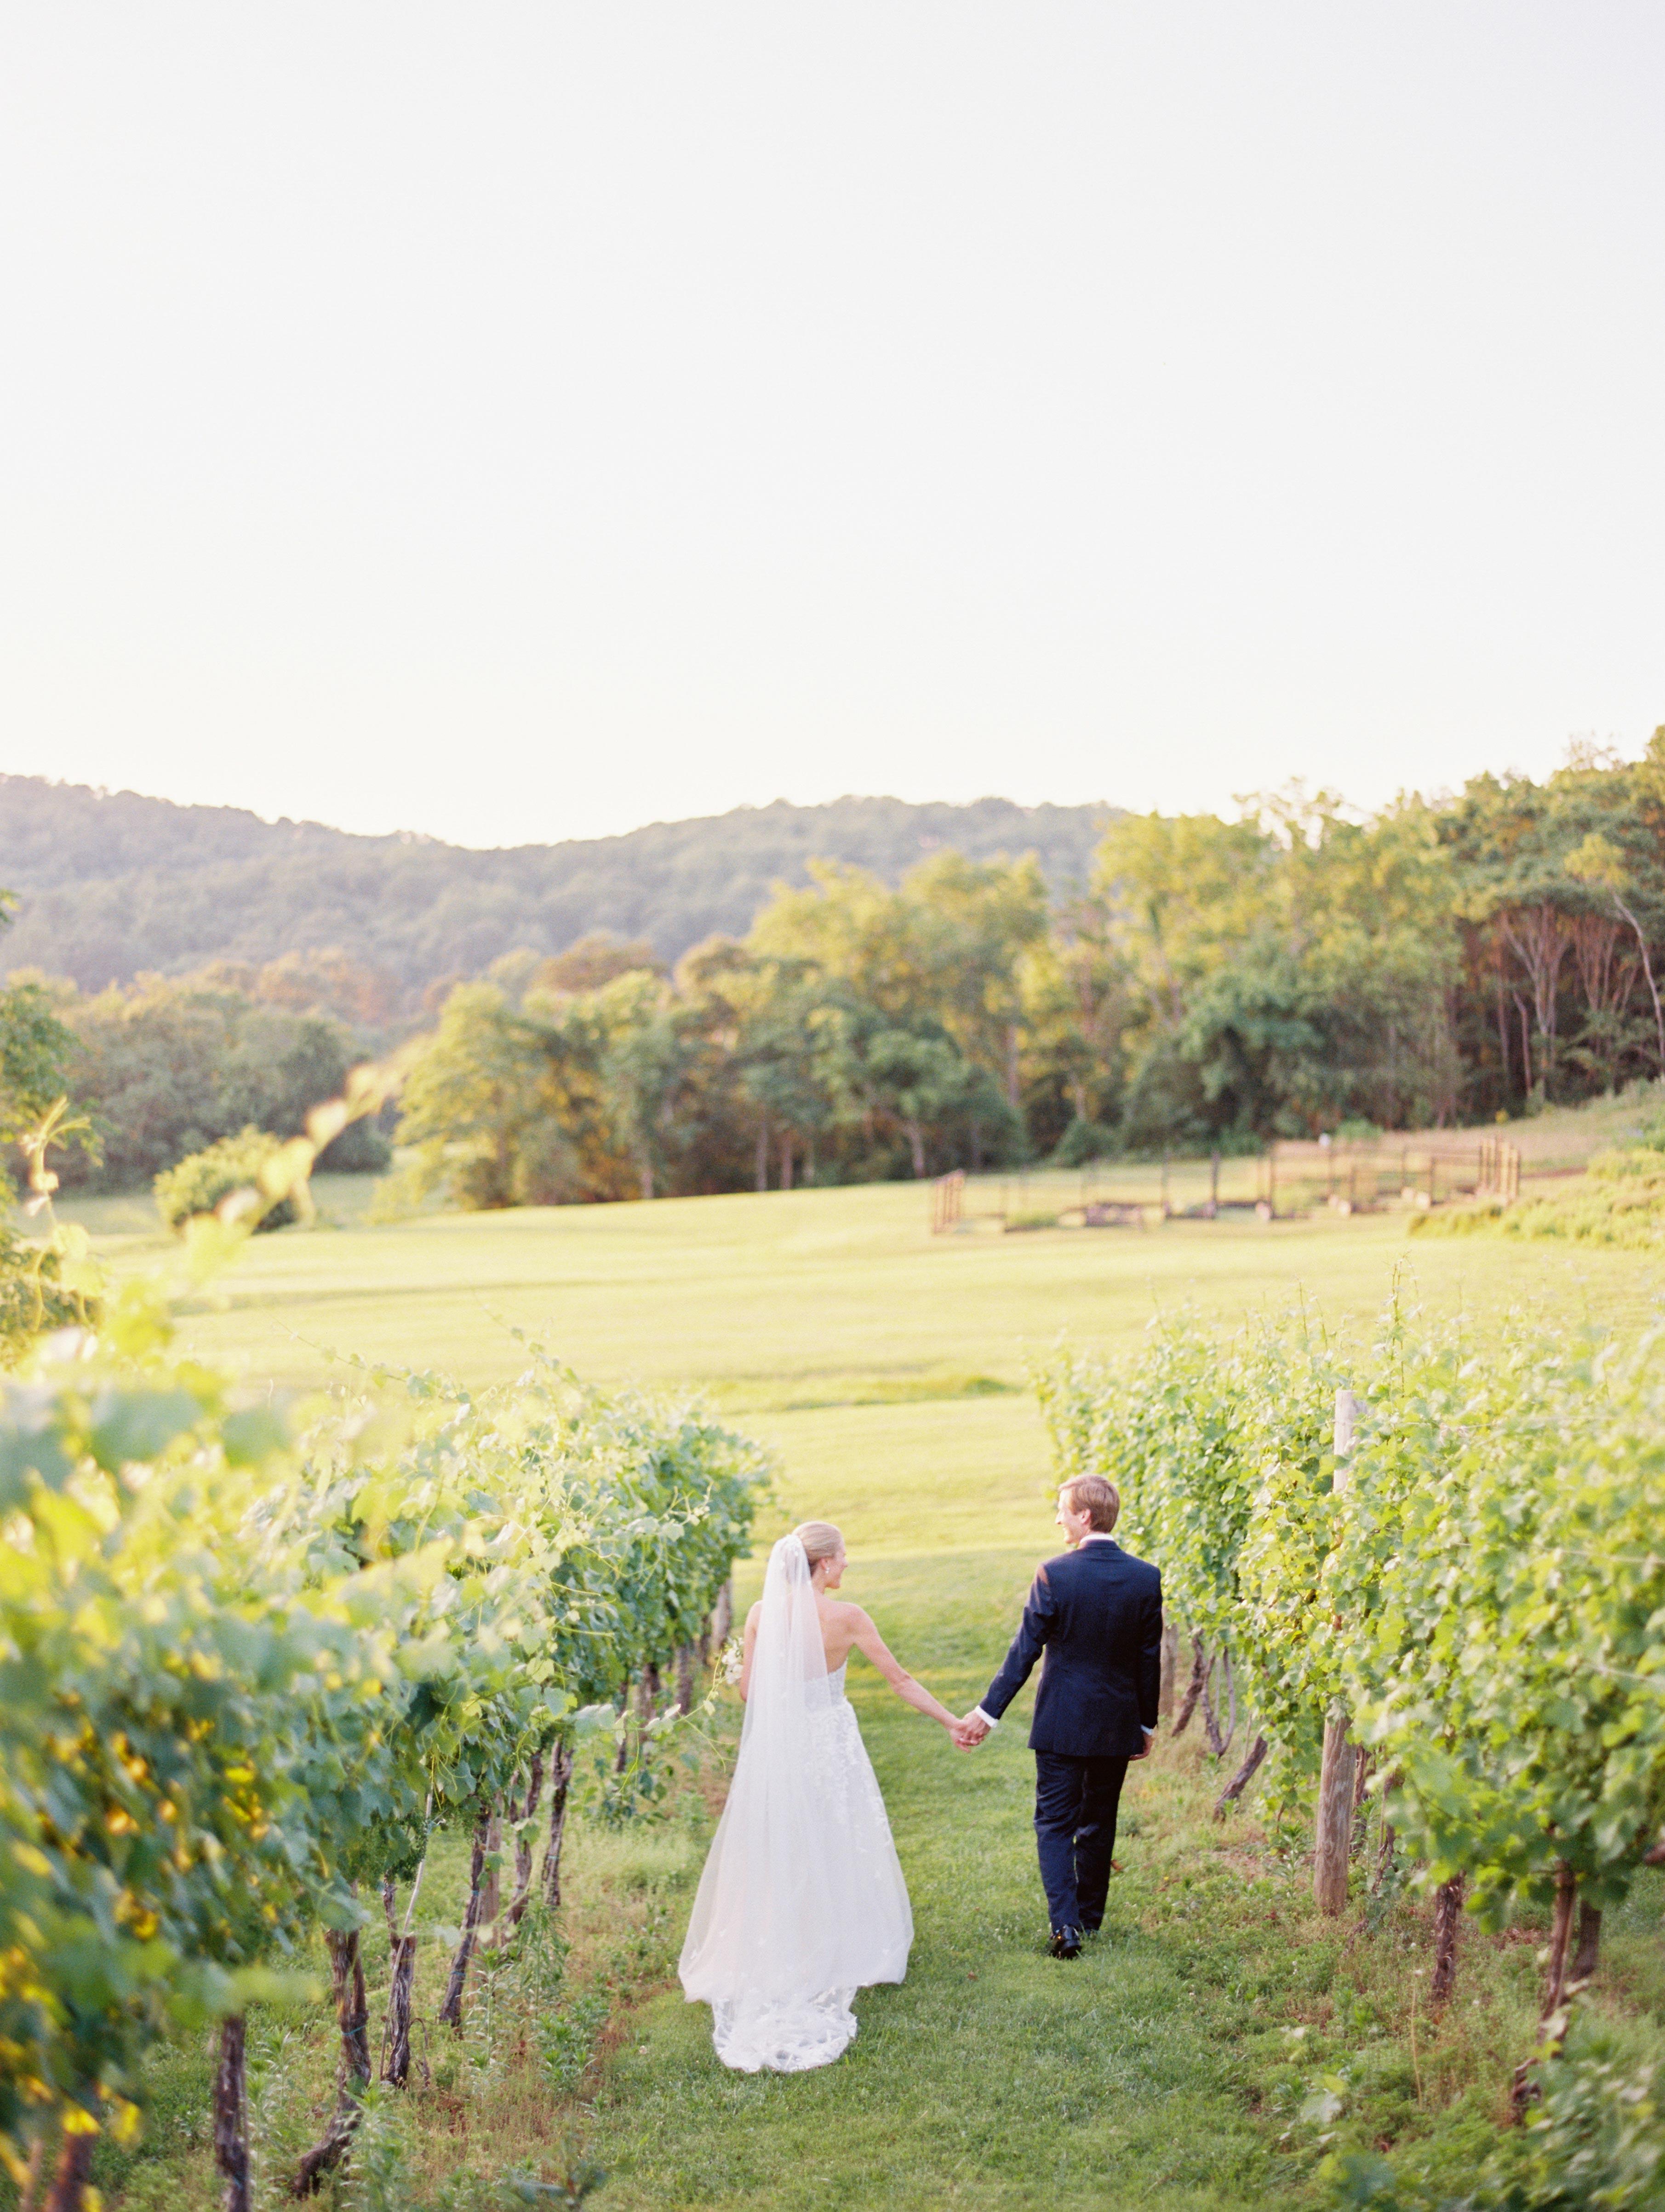 hannah chris wedding north garden va couple holding hands